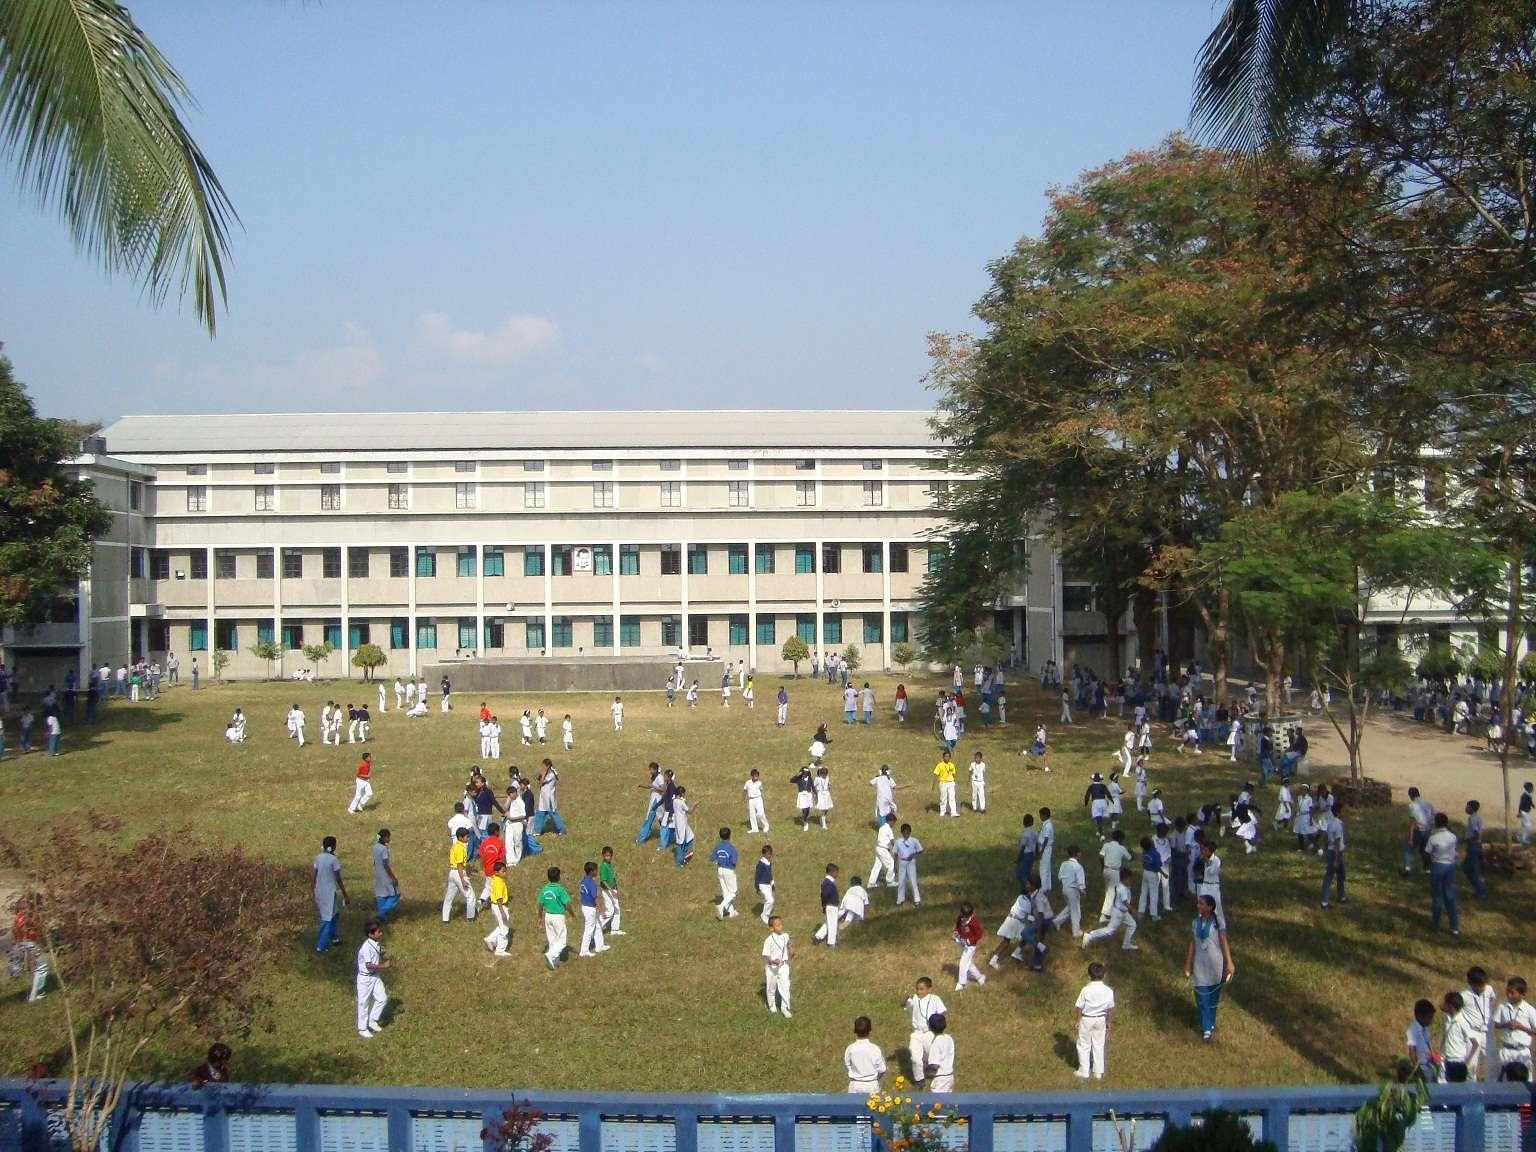 AUXILIUM CONVENT SCHOOL NEW CHUMTA P O VIA SUKNA SILIGURI DISTT DARJEELING WEST BENGAL 2430034